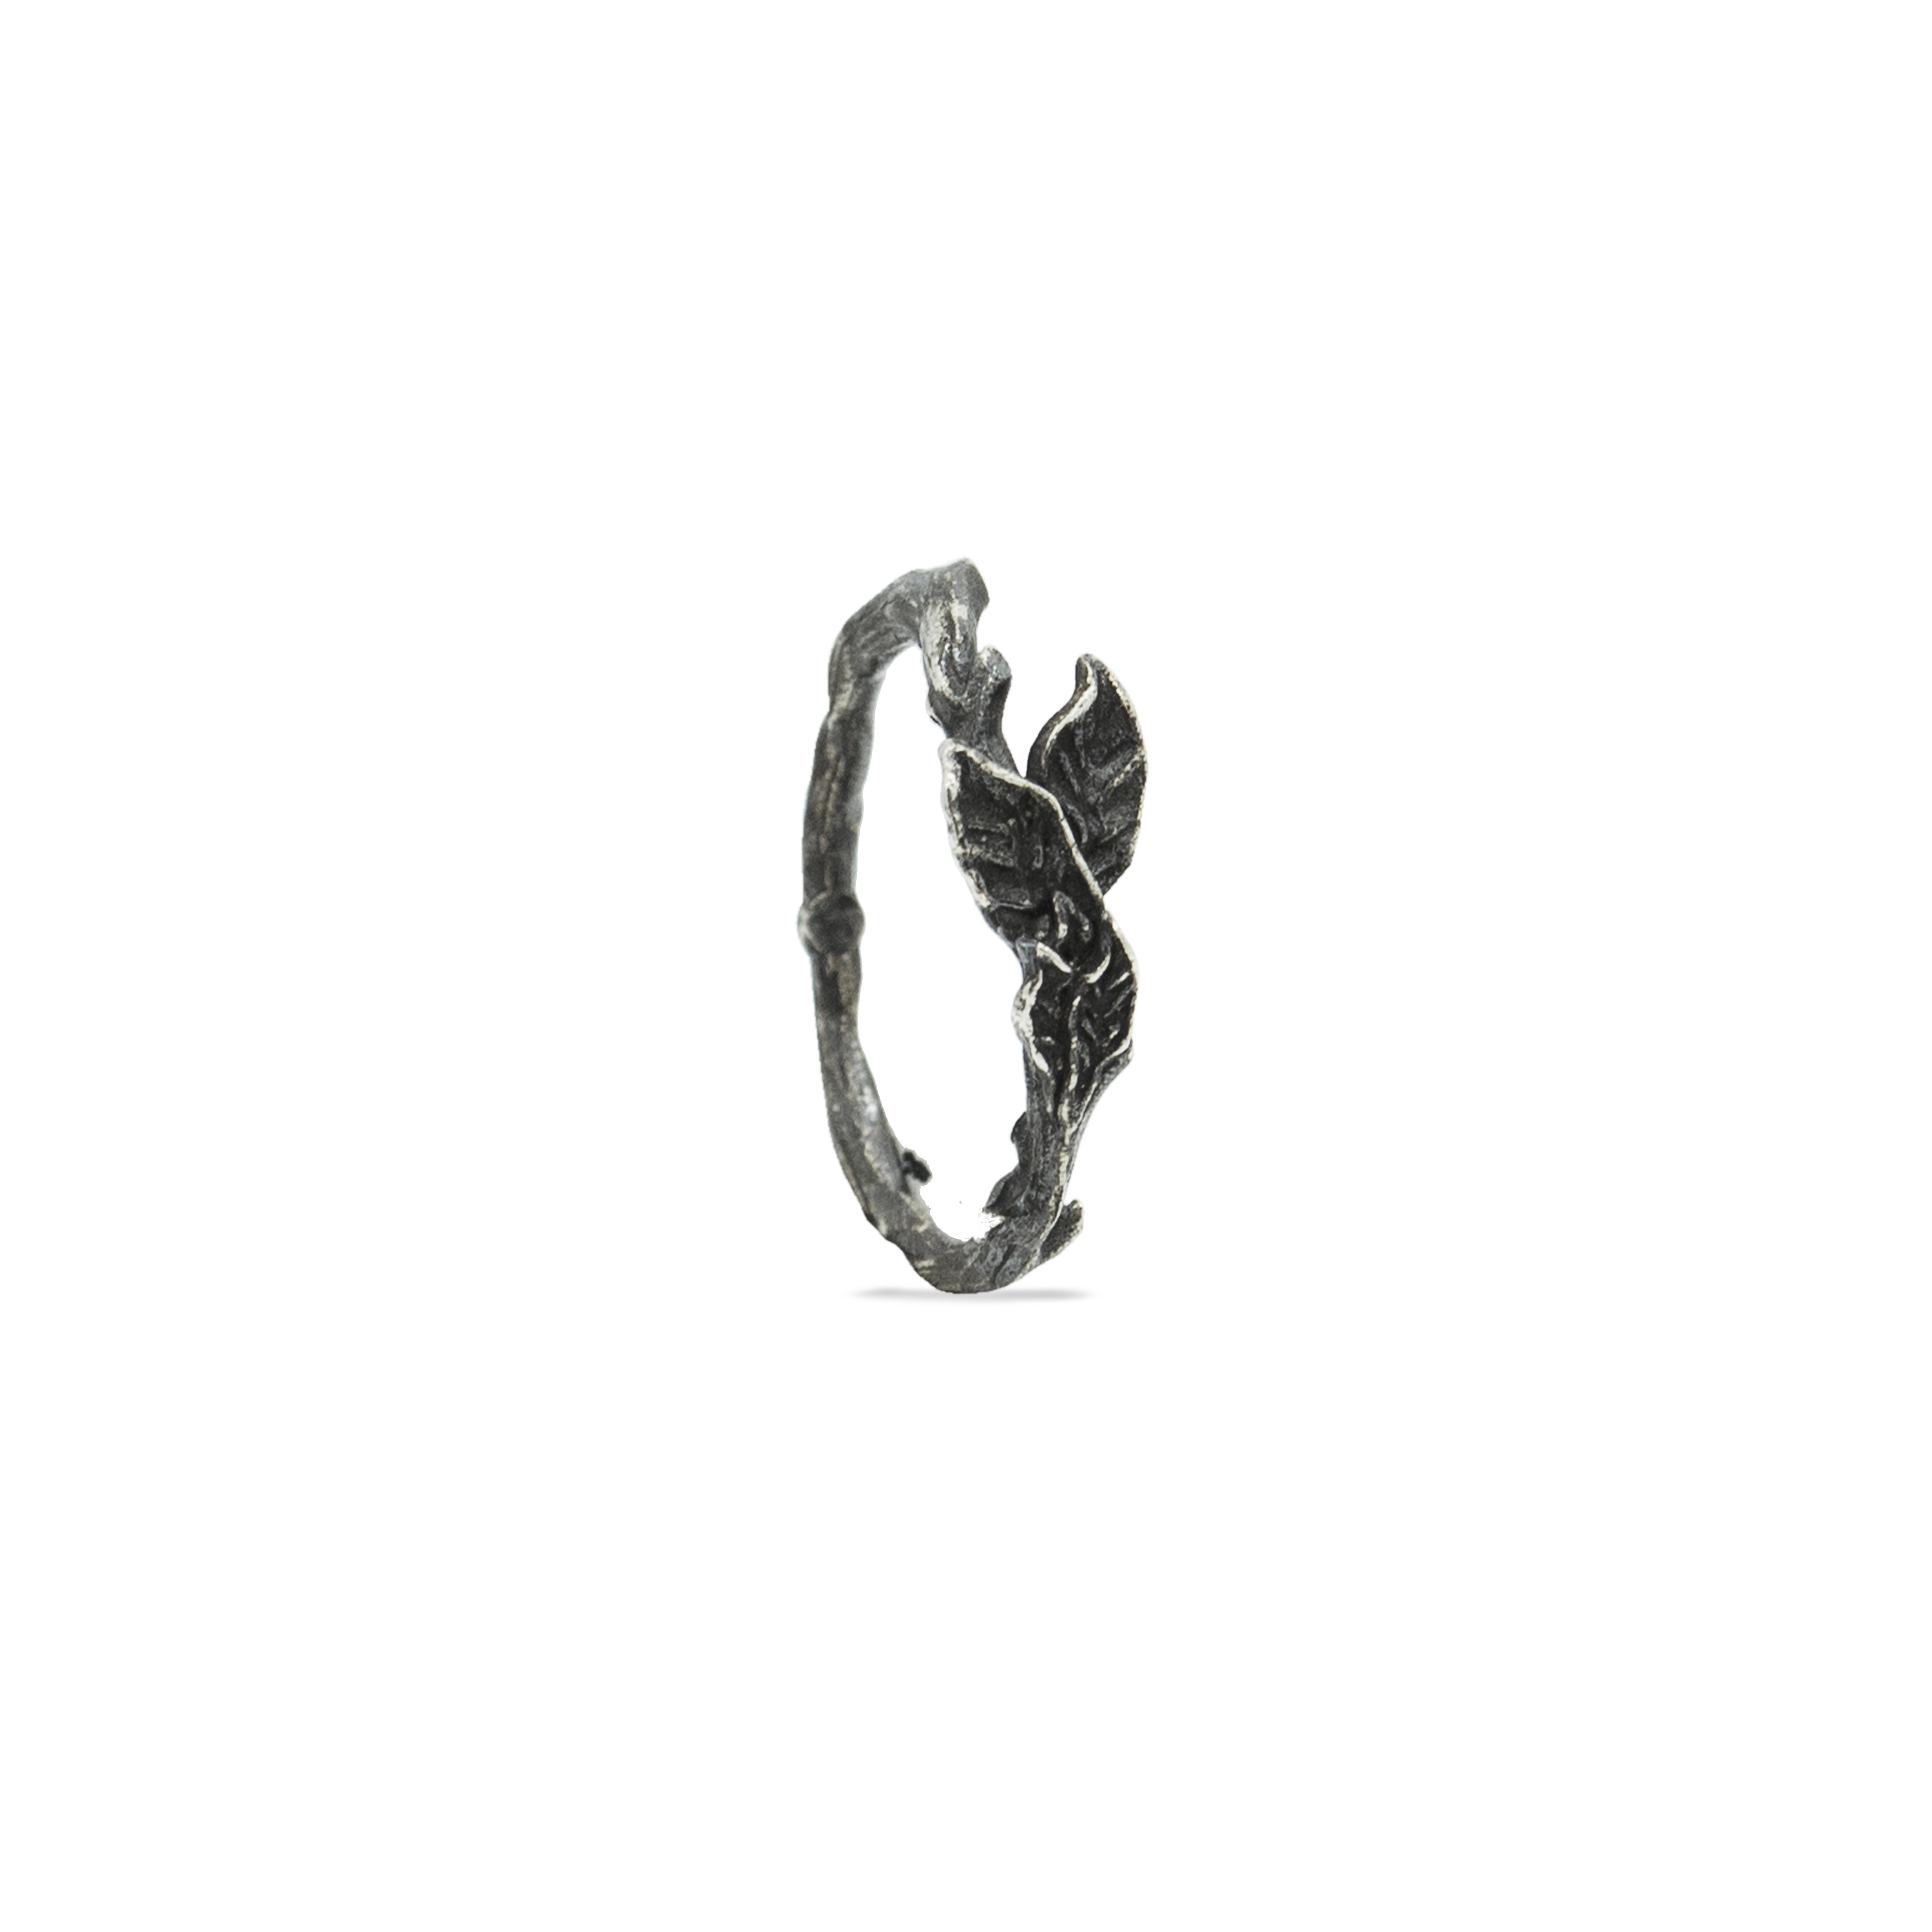 Demetra silver ring